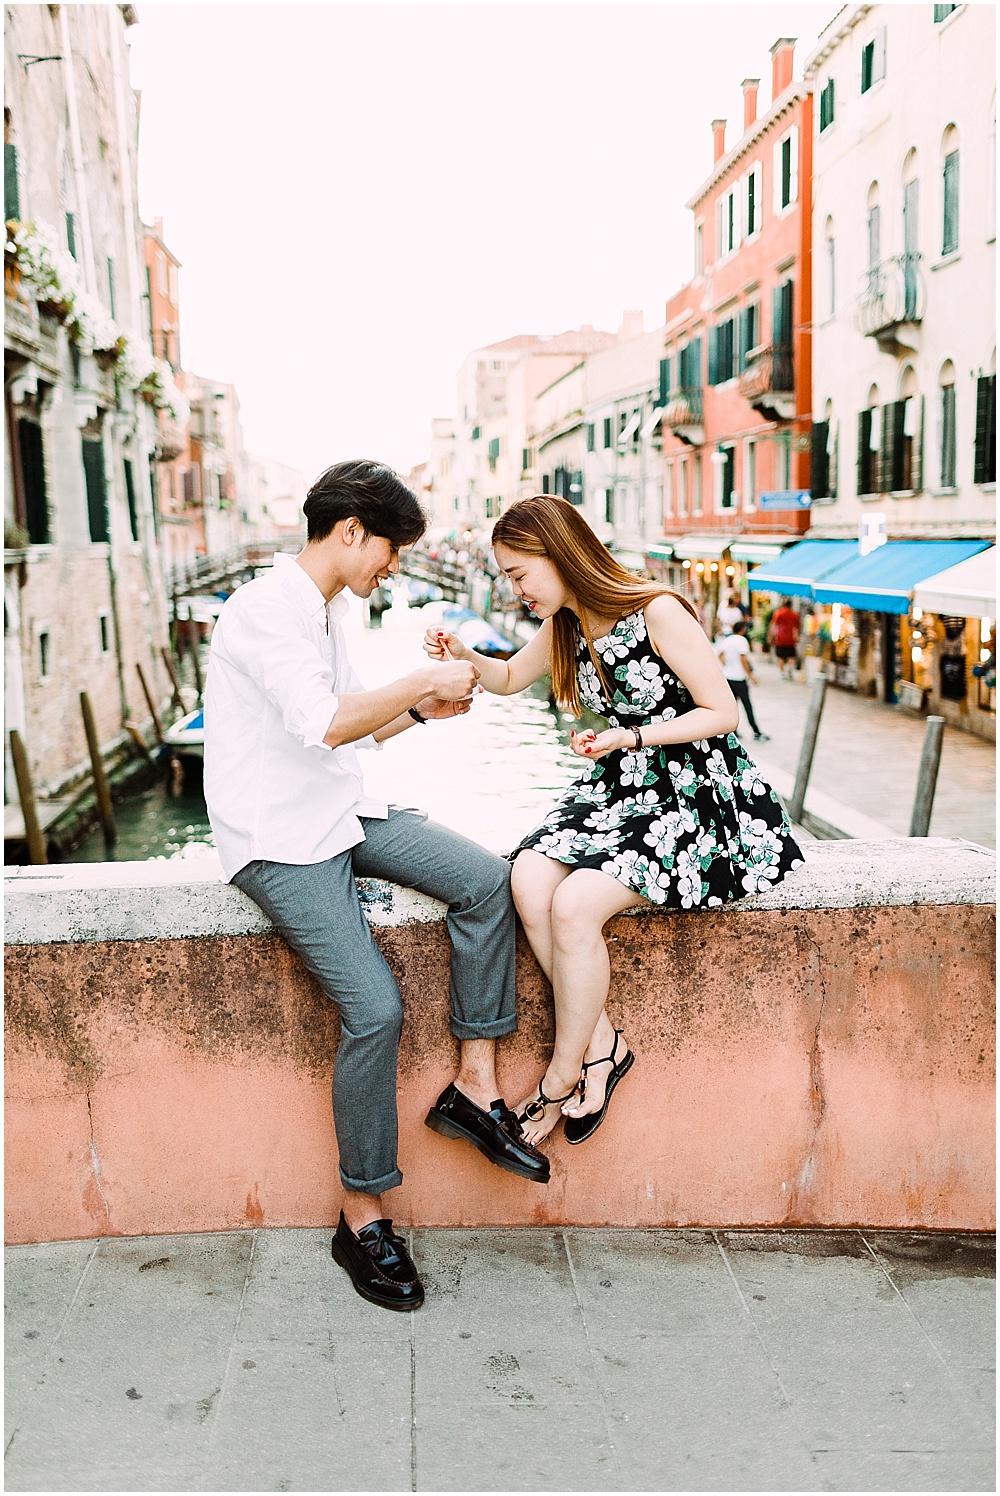 romantic-photoshoot-venice-stefano-degirmenci_0131.jpg